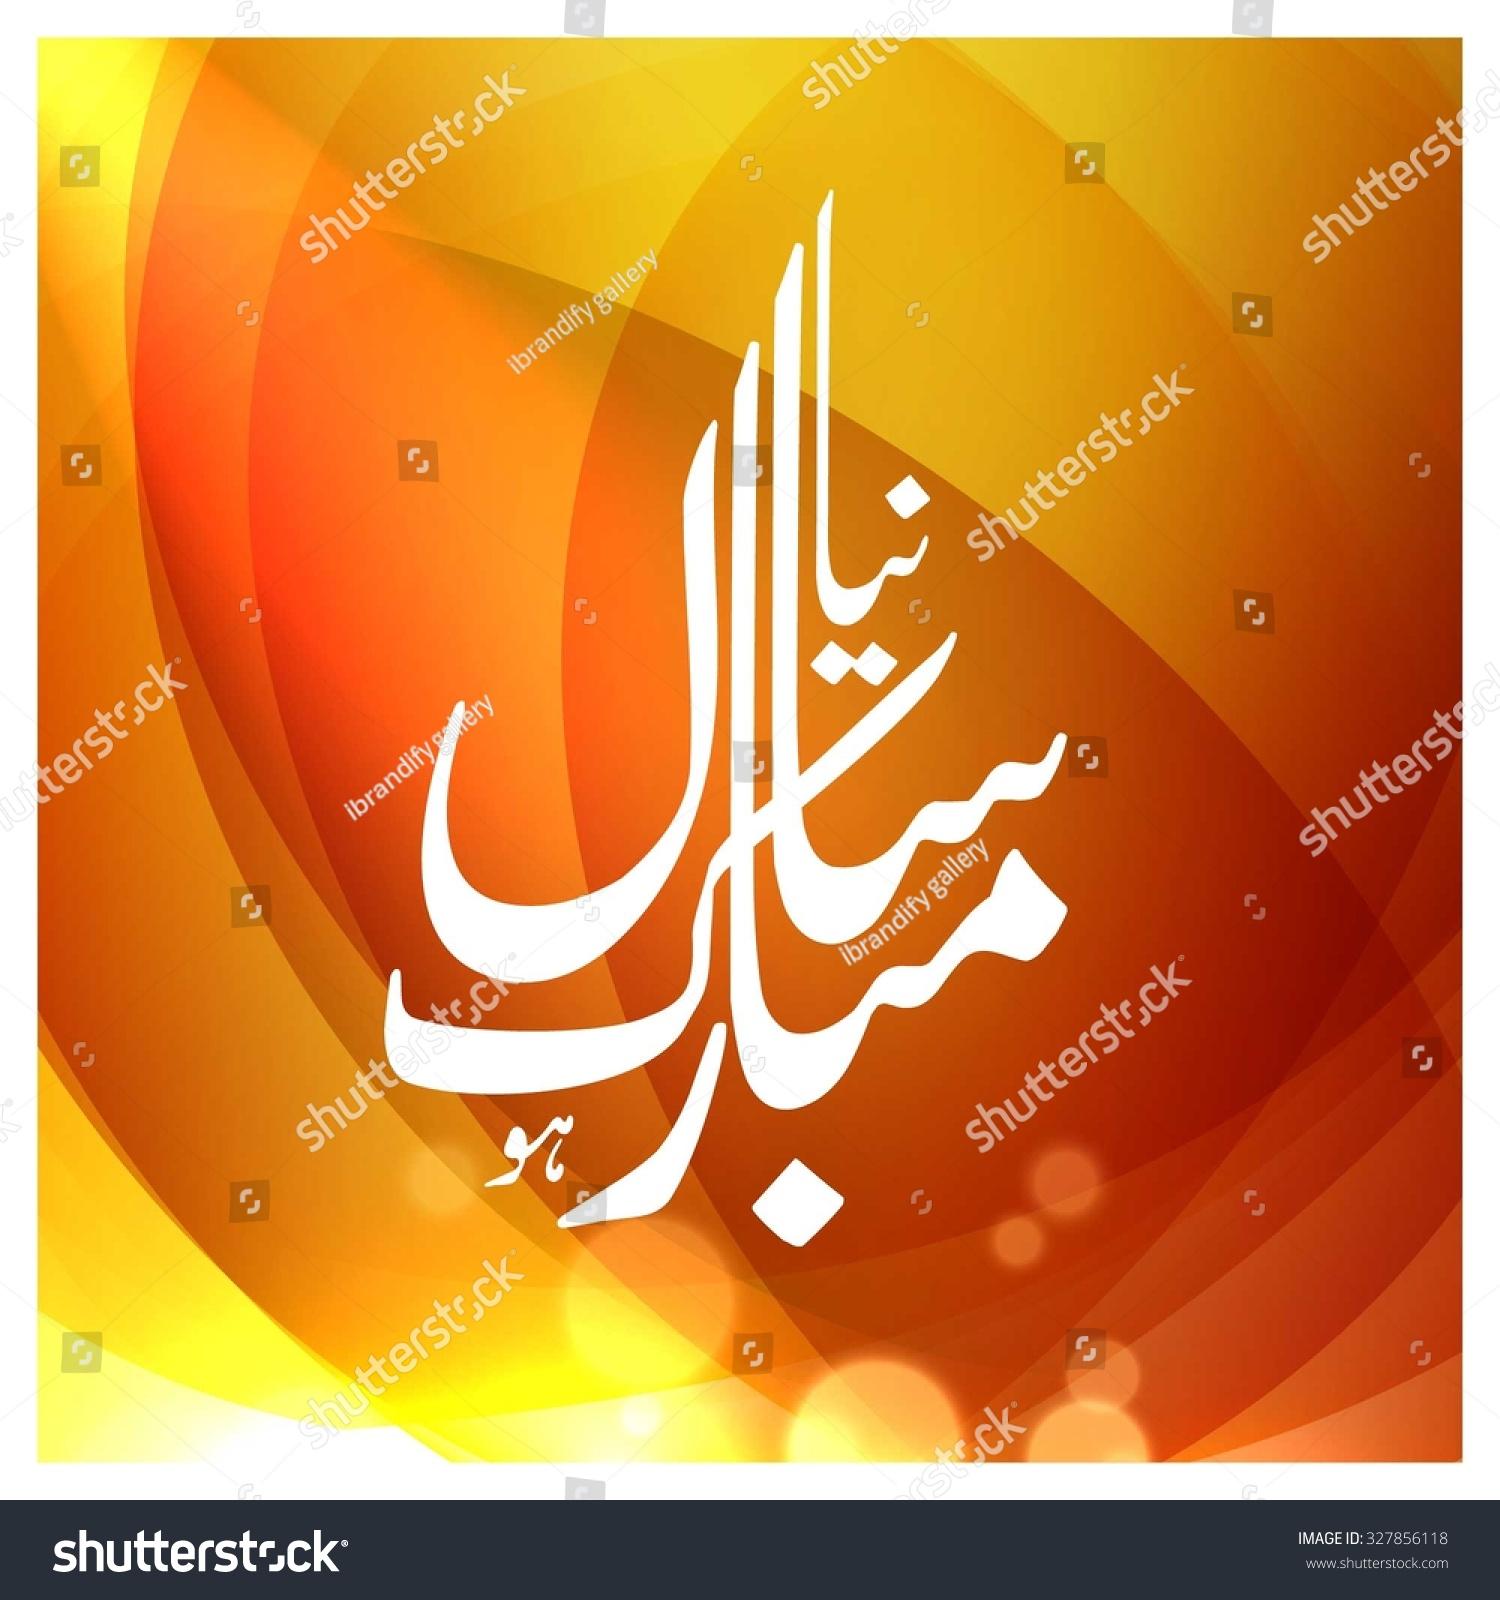 Royalty free urdu calligraphy of naya saal mubarak 327856118 stock urdu calligraphy of naya saal mubarak ho urdu calligraphy happy new year on abstract background m4hsunfo